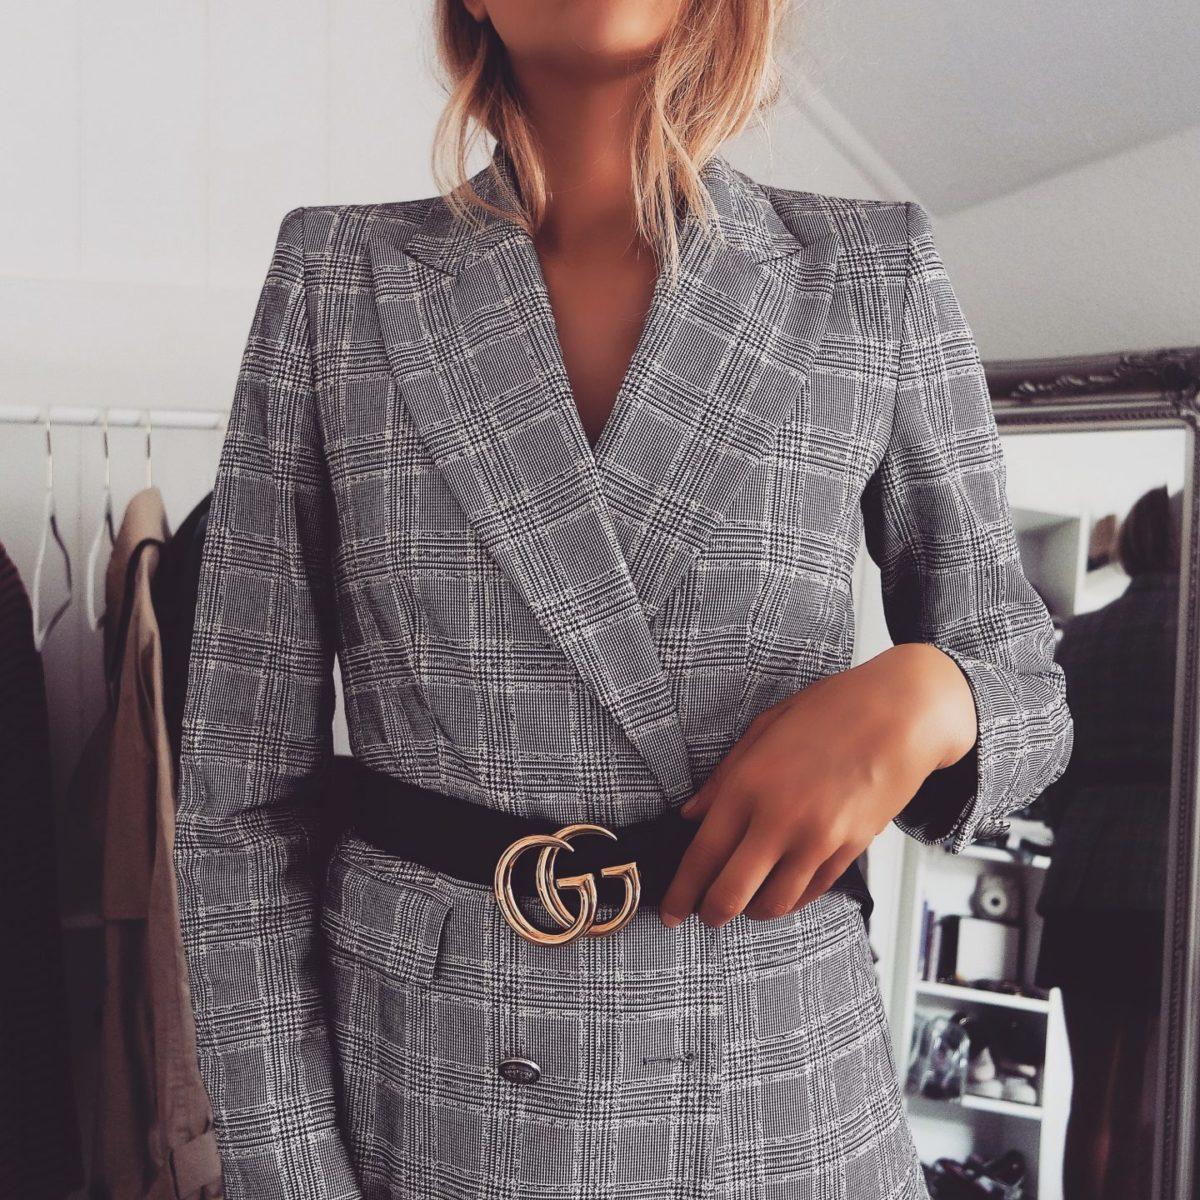 12bcb7c12756cd A Febre na Moda do Cinto Gucci